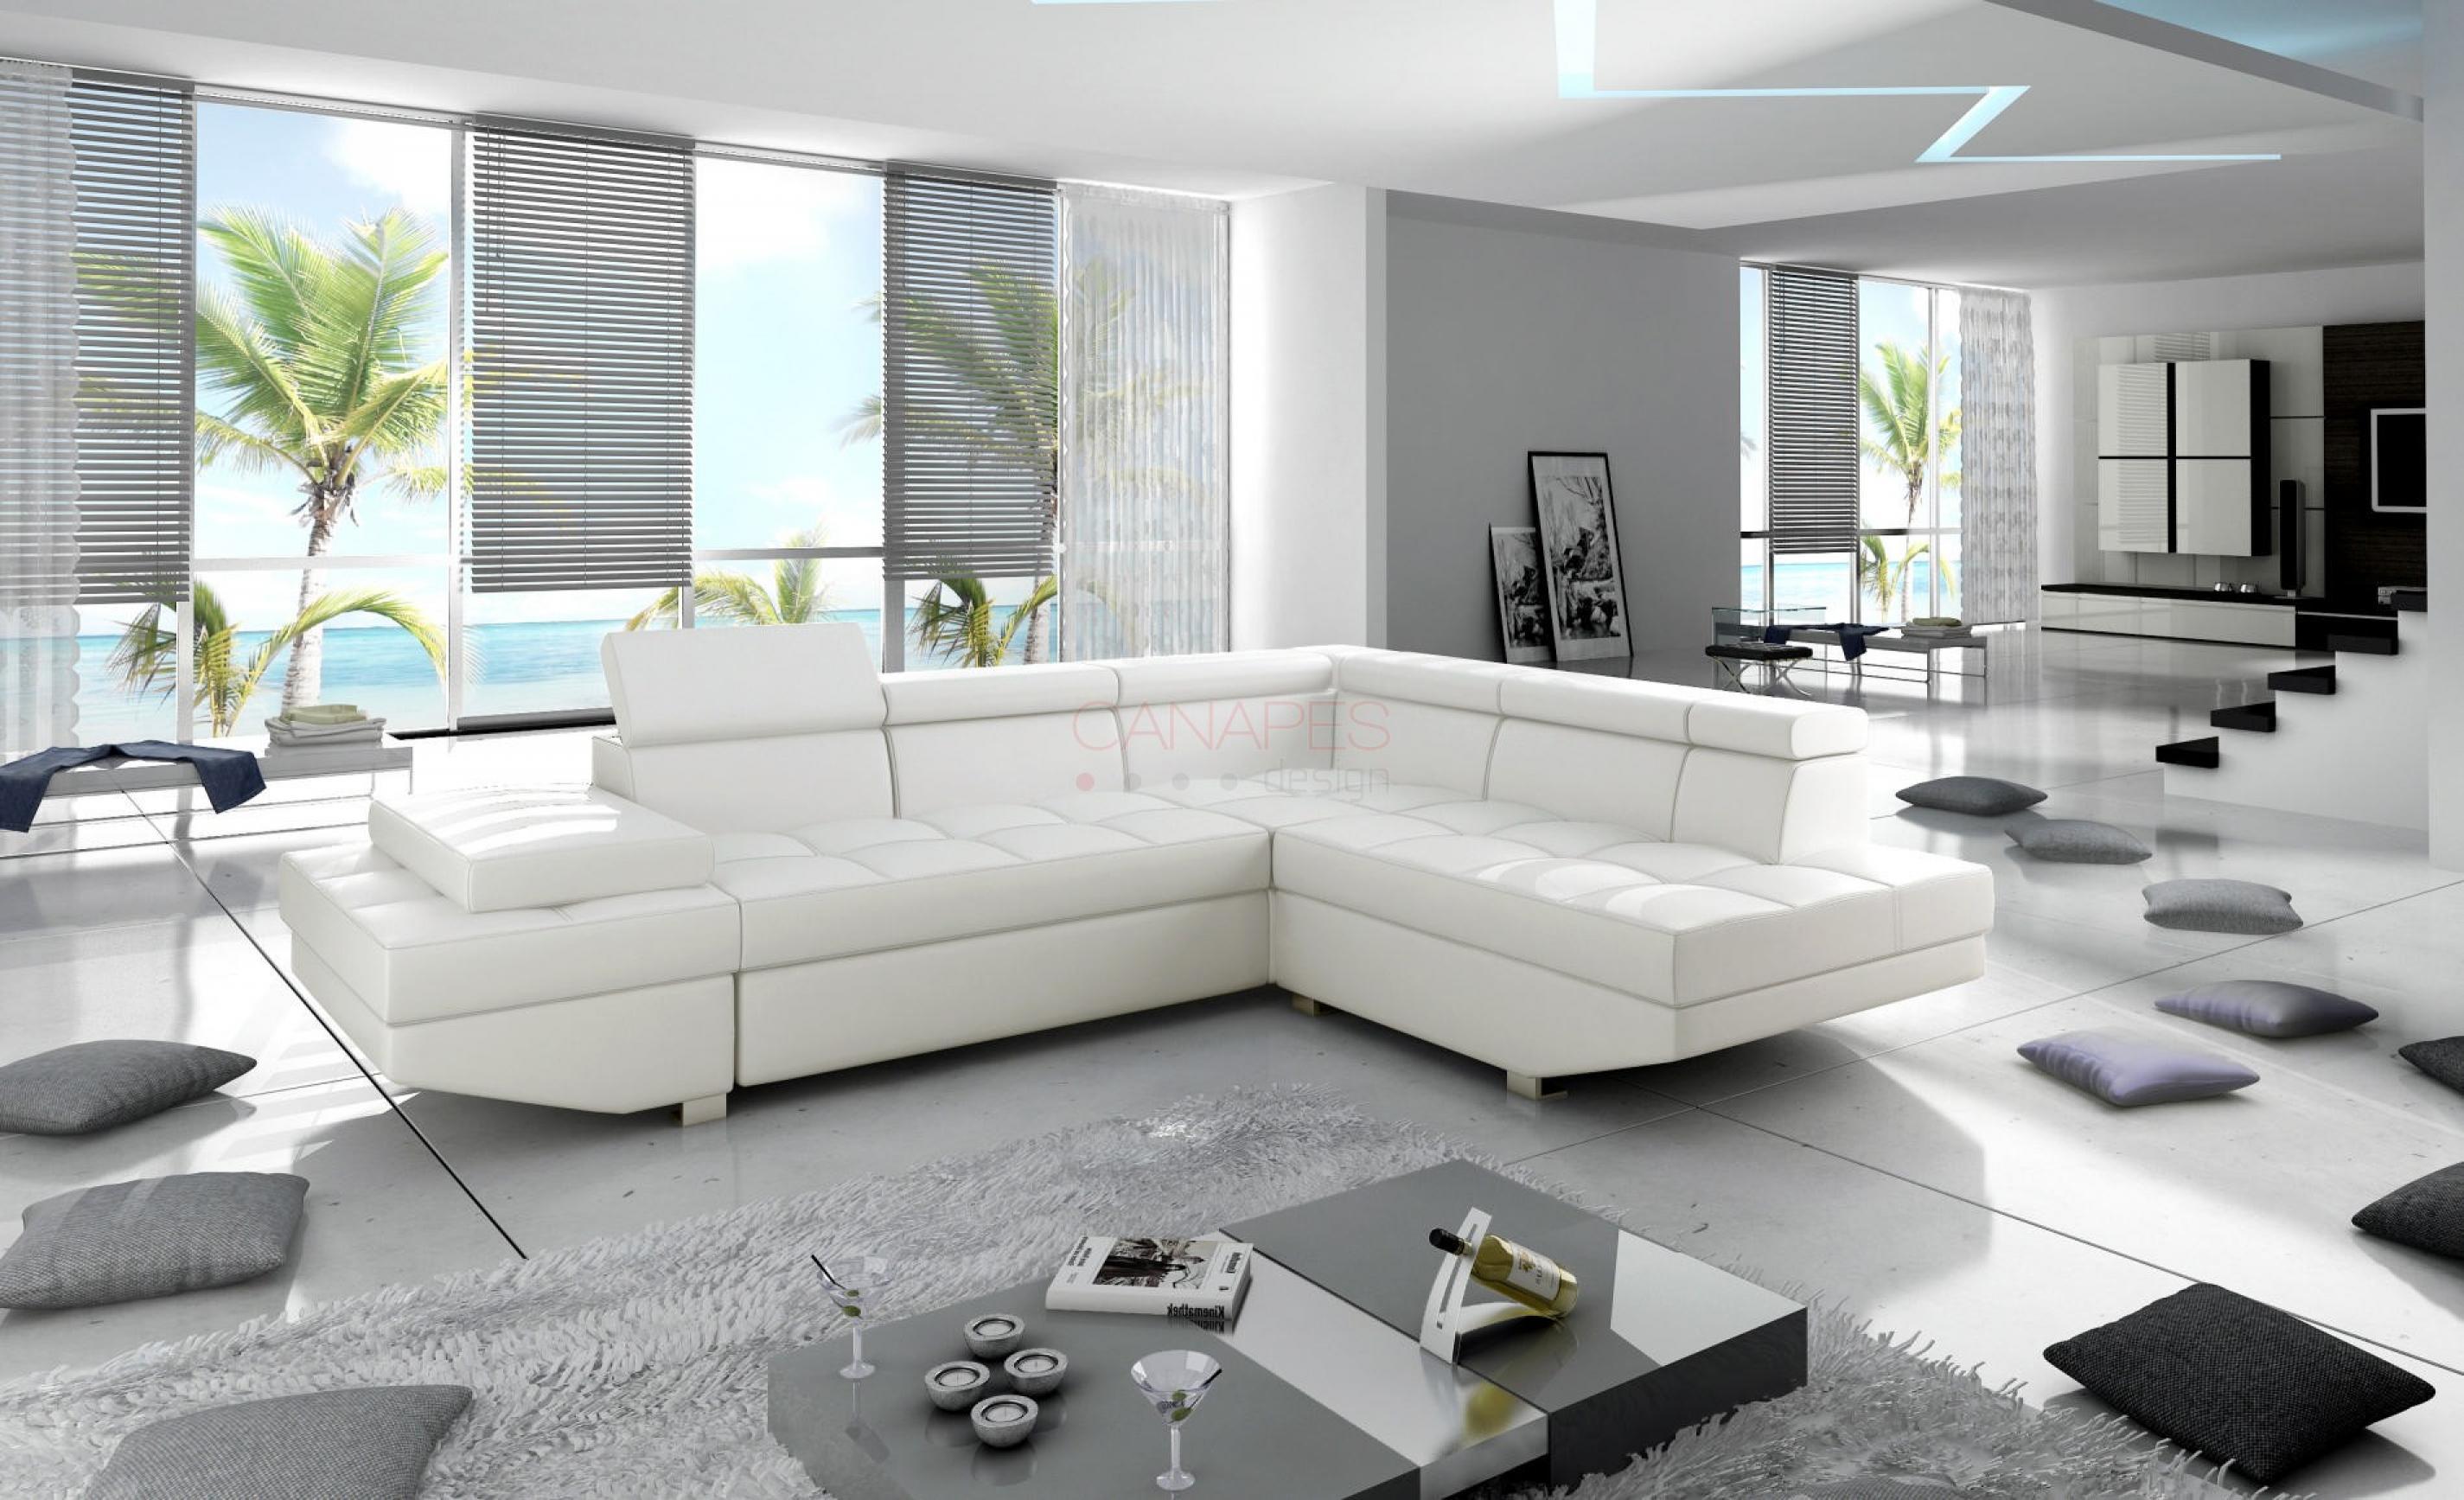 photos canap d 39 angle design convertible. Black Bedroom Furniture Sets. Home Design Ideas